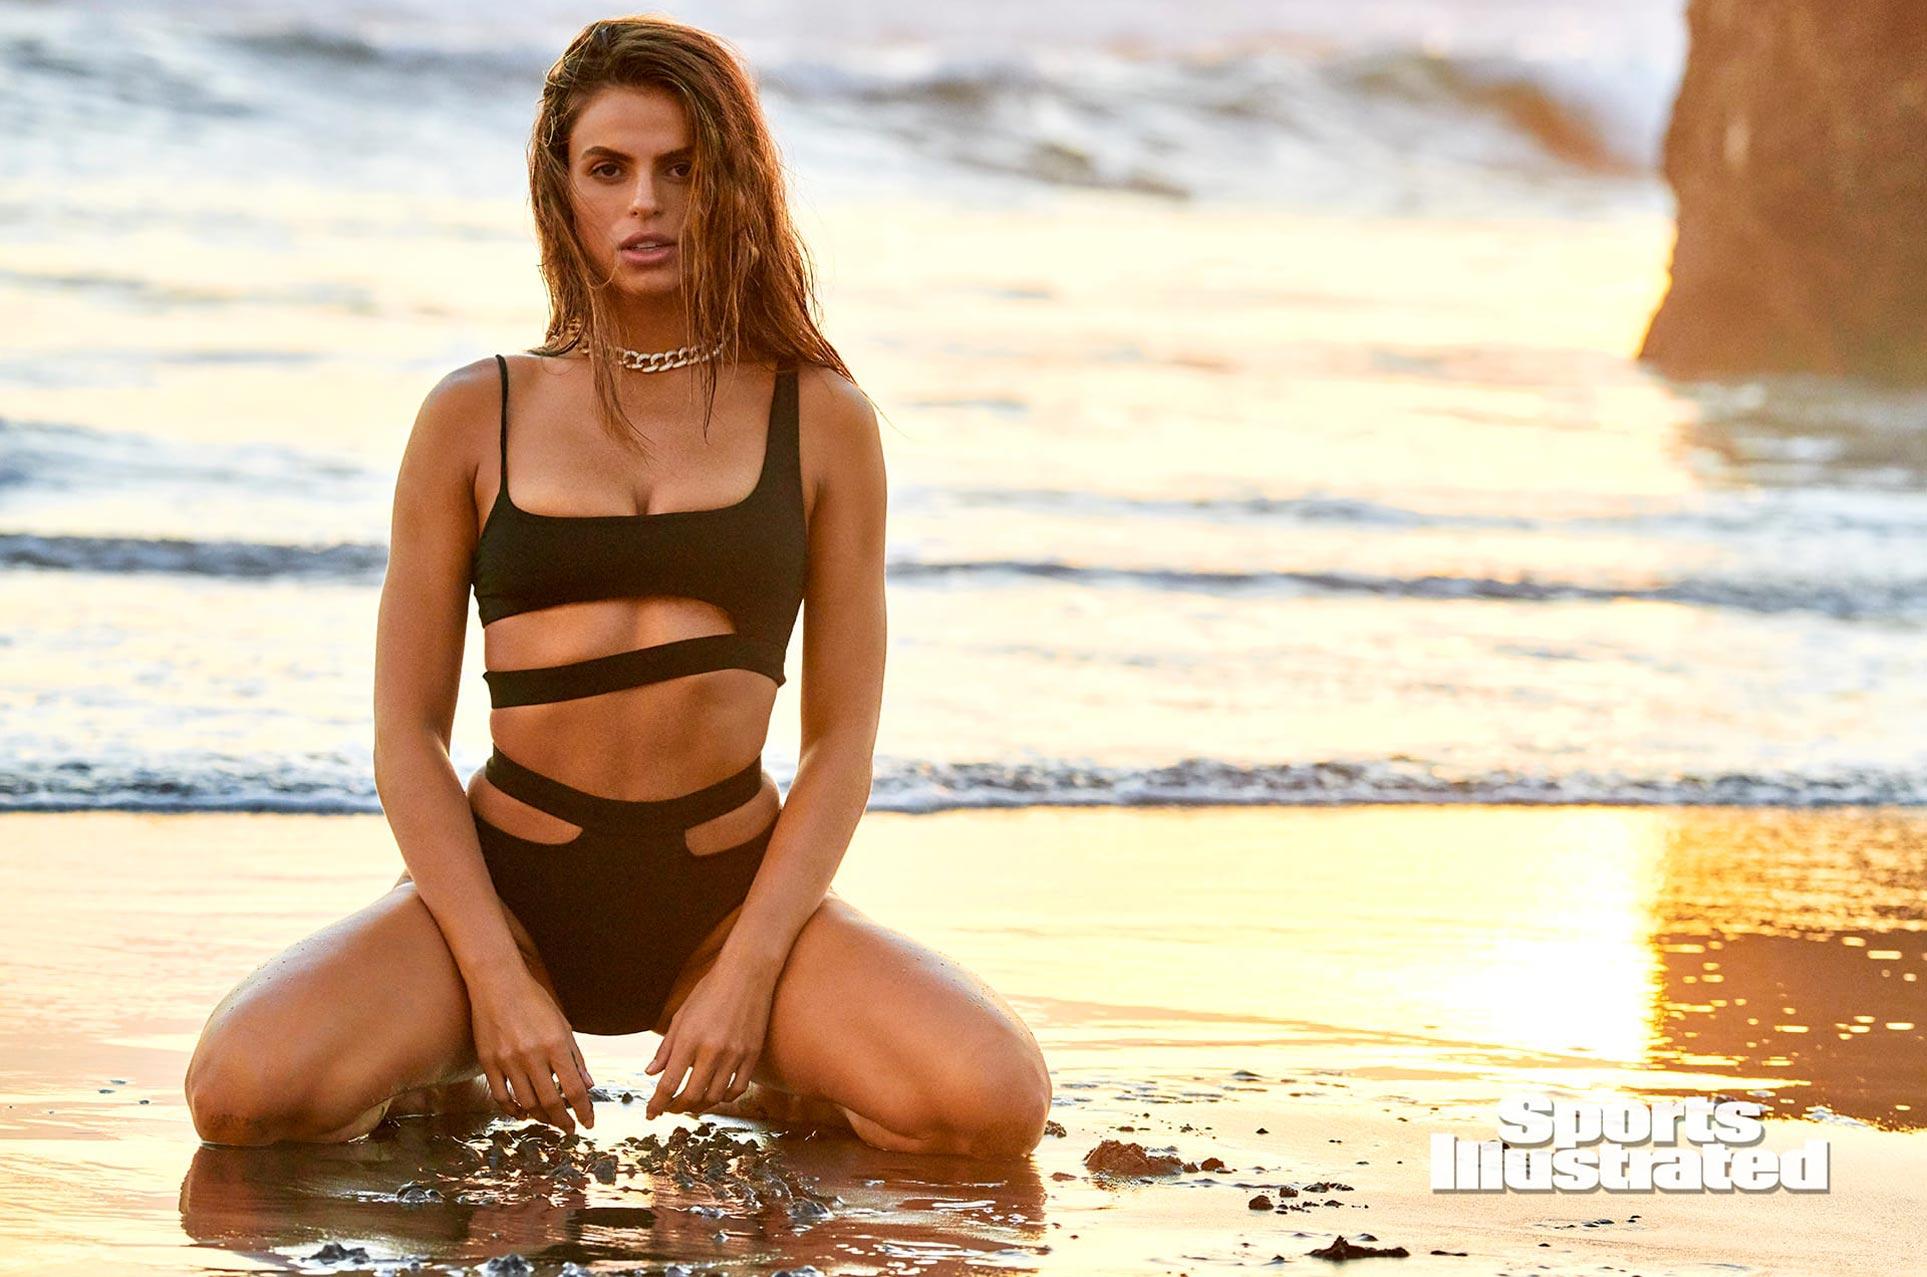 Брукс Надер в каталоге купальников Sports Illustrated Swimsuit 2020 / фото 17